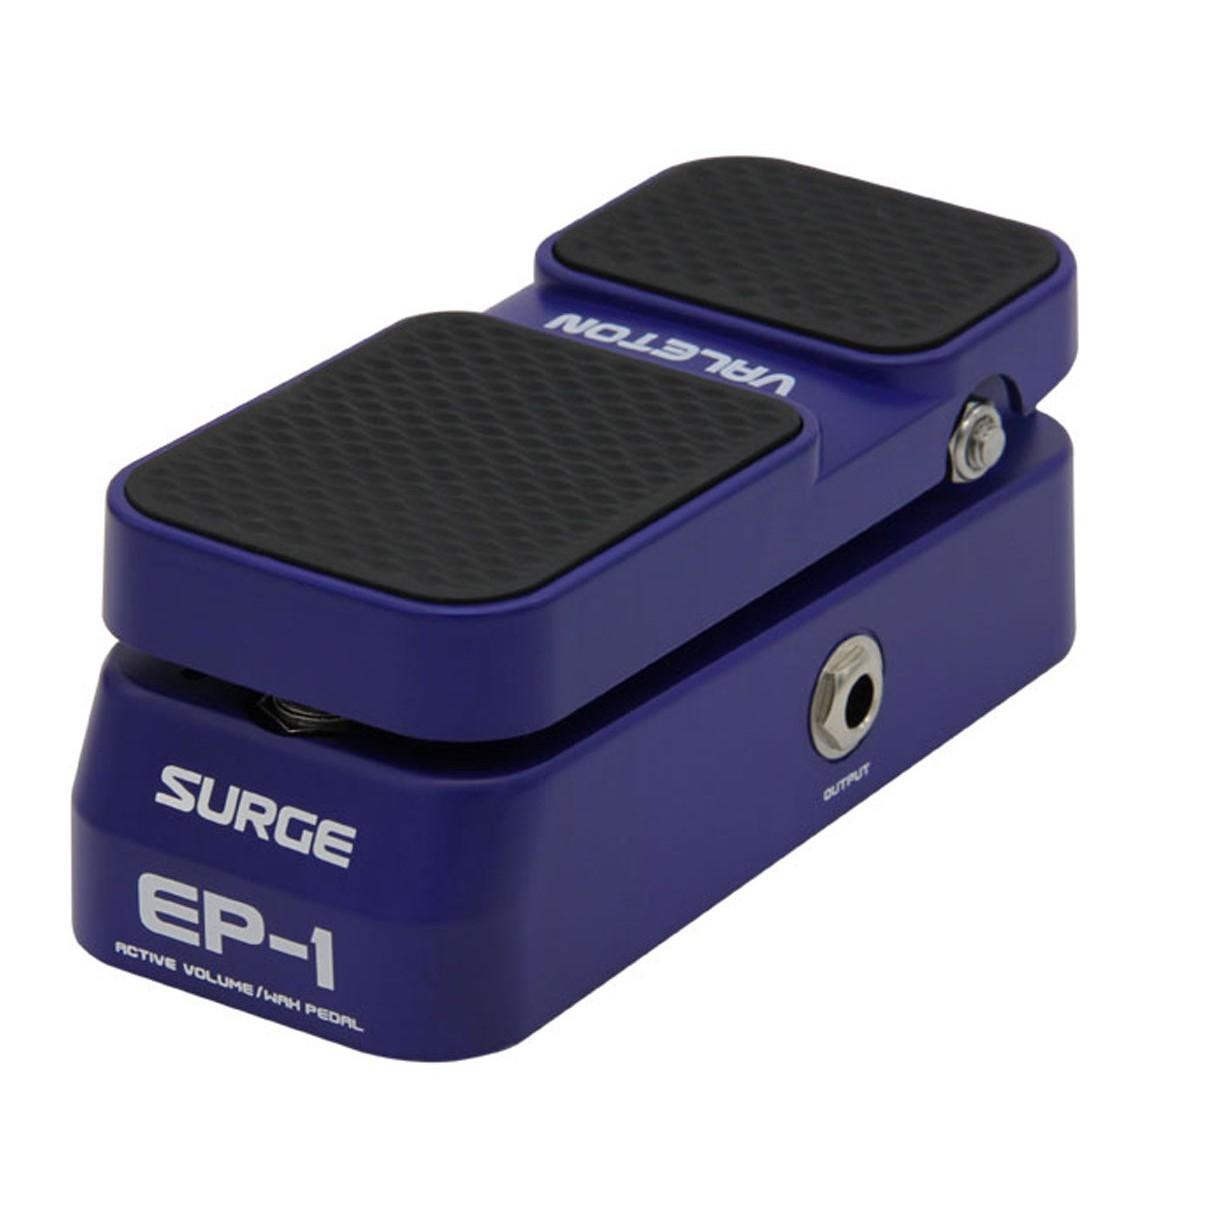 valeton surge ep 1 mini wah active volume pedal. Black Bedroom Furniture Sets. Home Design Ideas